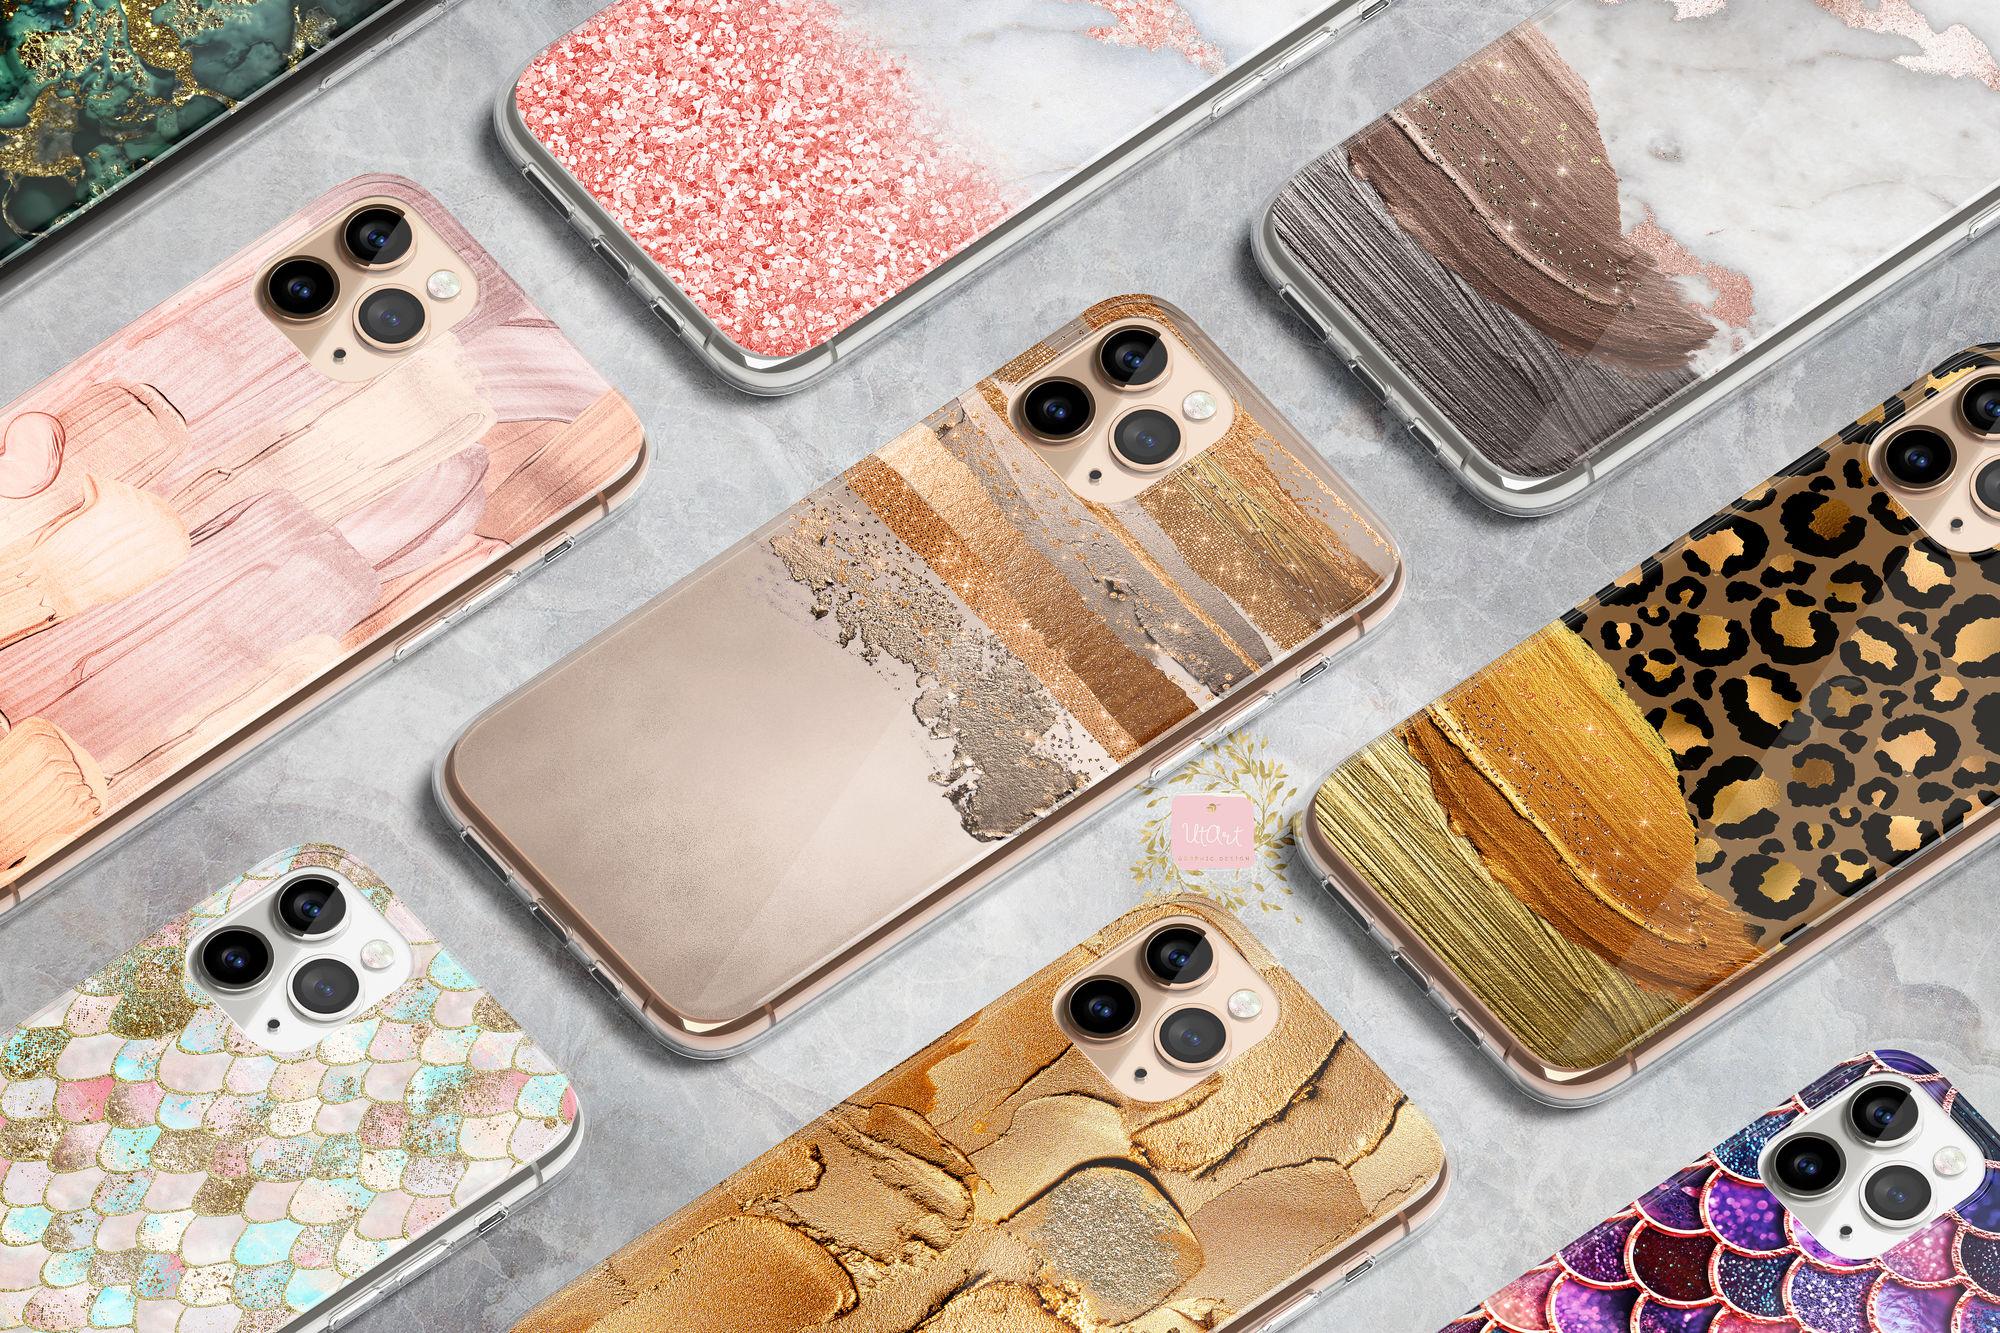 UTART Trend Glamour Feminine Iphone Cases Collection